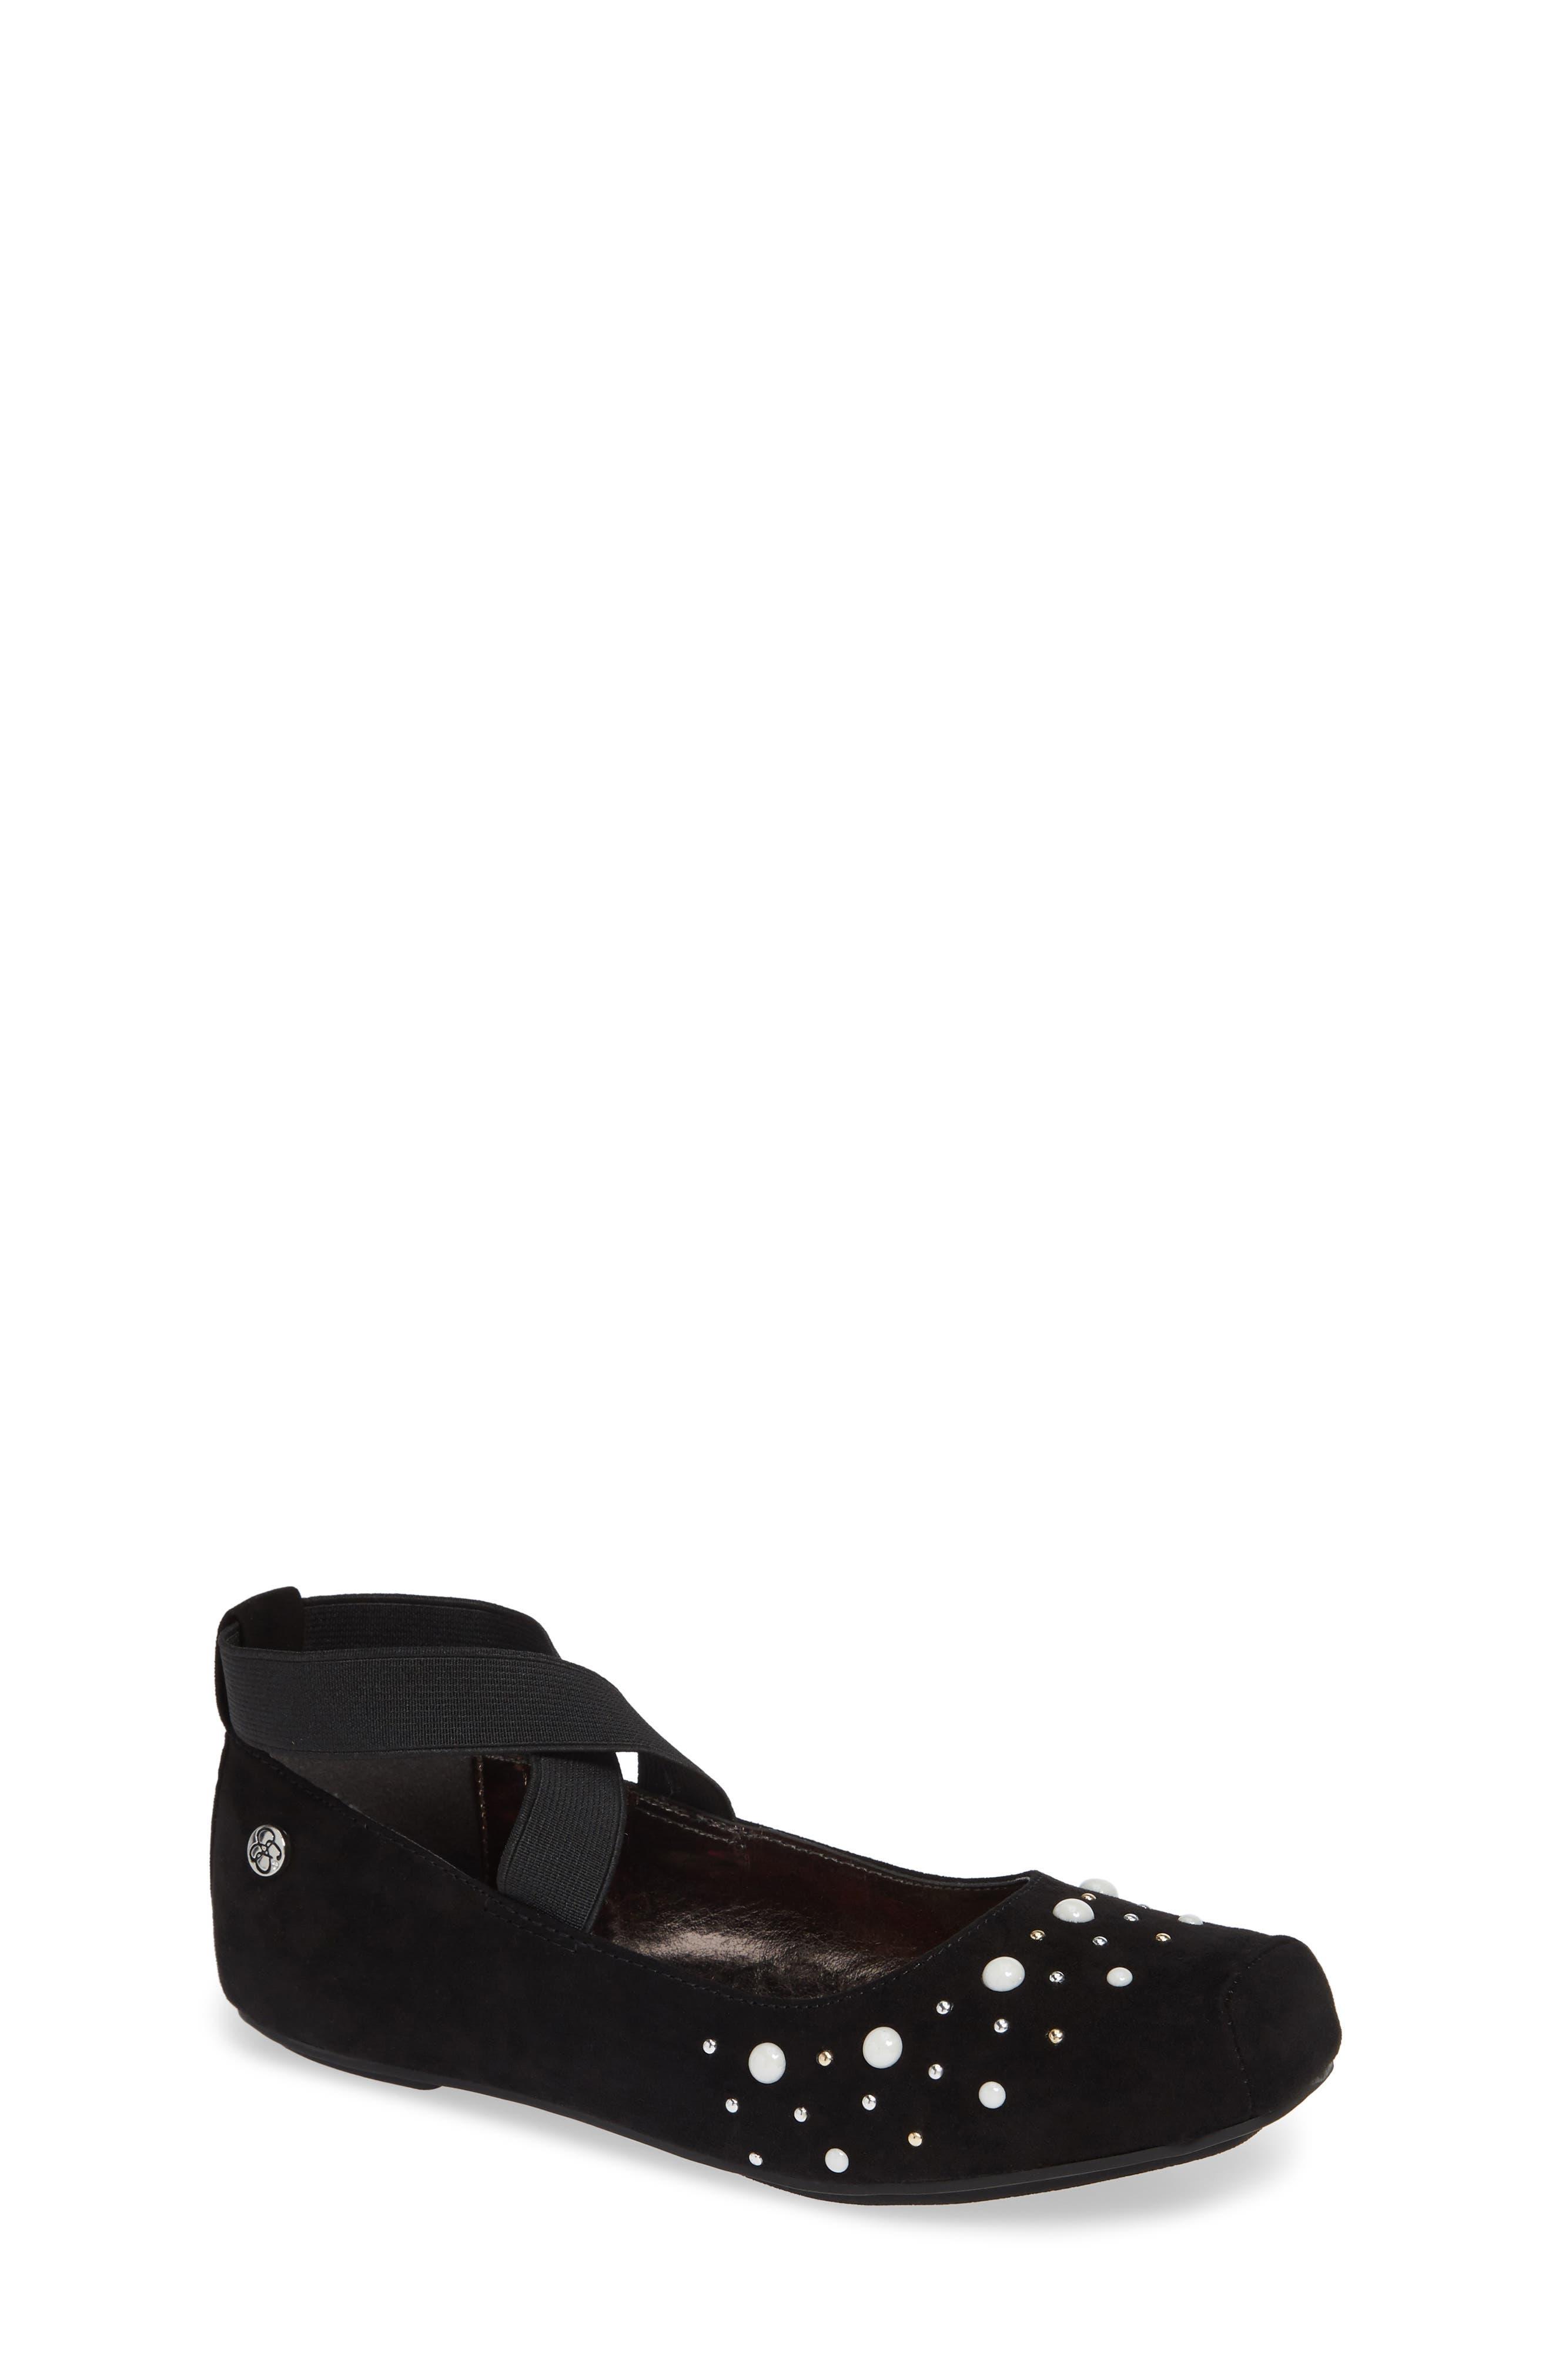 Cross Strap Ballet Flat, Main, color, BLACK MICRO SUEDE W/ PEARLS